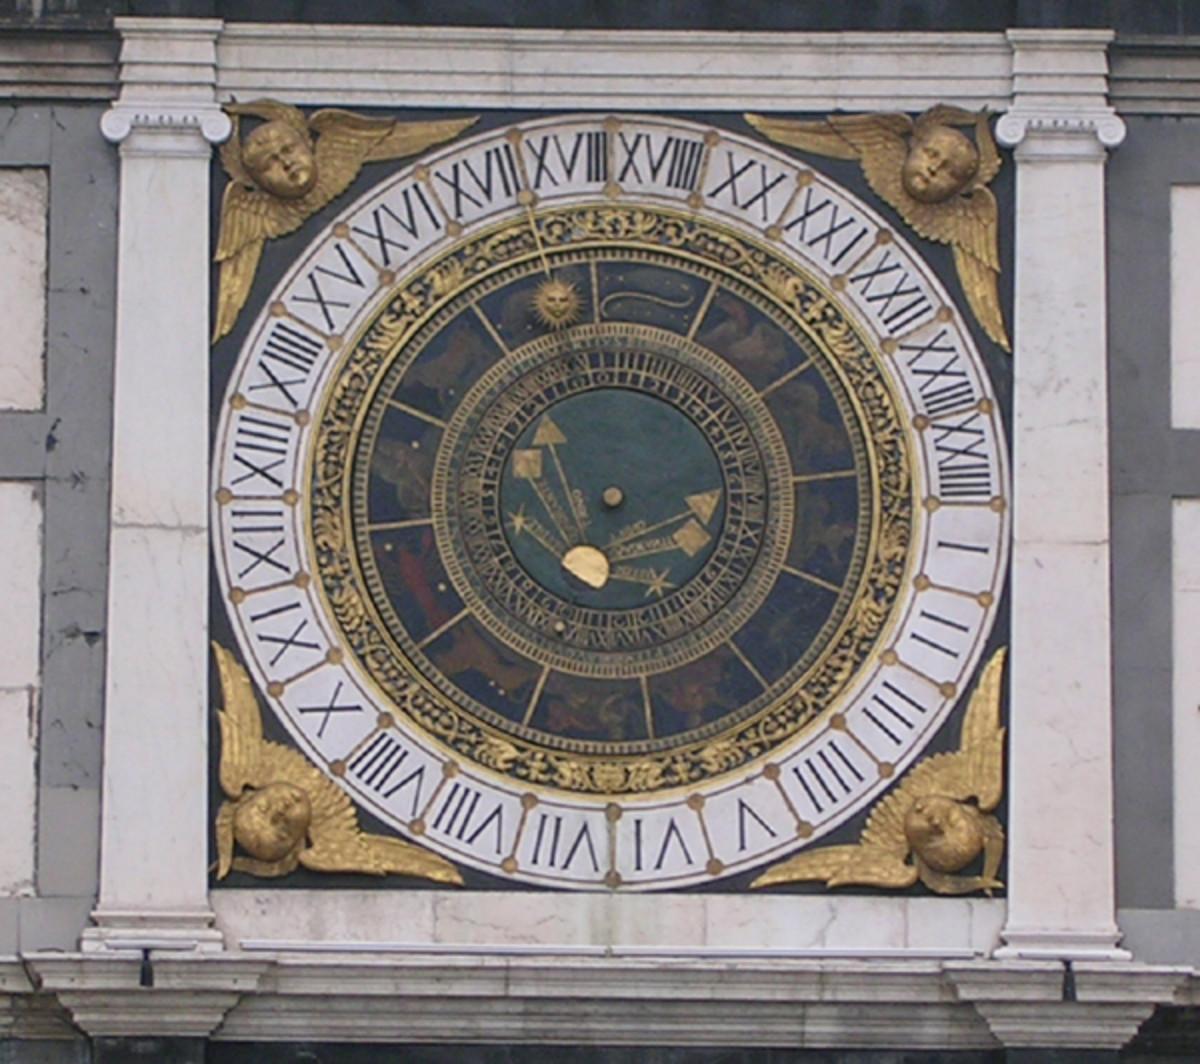 Neat Old Clock - Public Domain